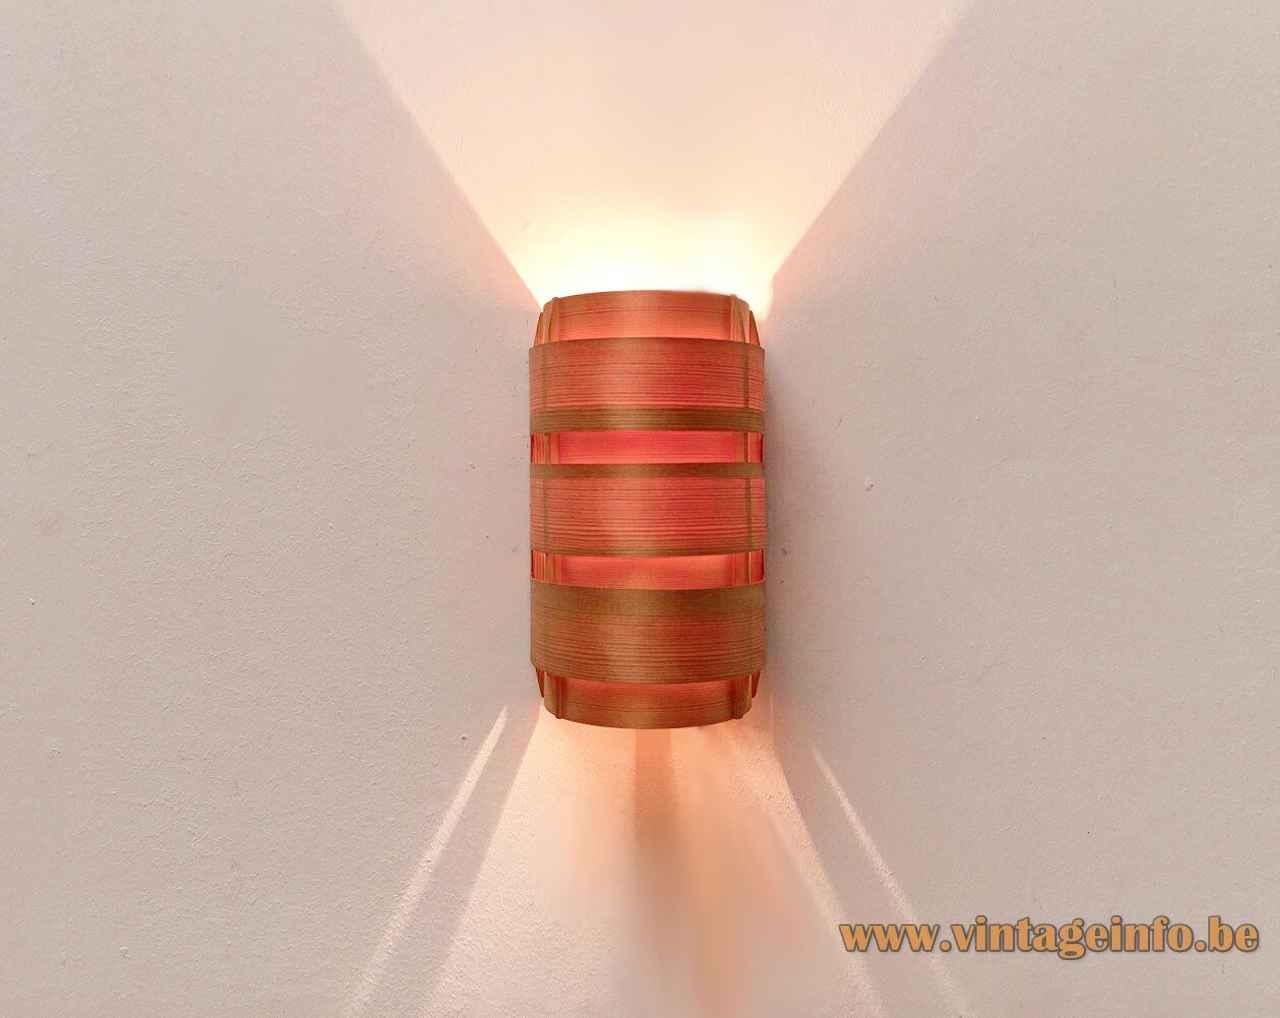 Hans-Agne Jakobsson Edda wall lamp curved pine slats lampshade 1960s AB Ellysett Sweden 1961 design